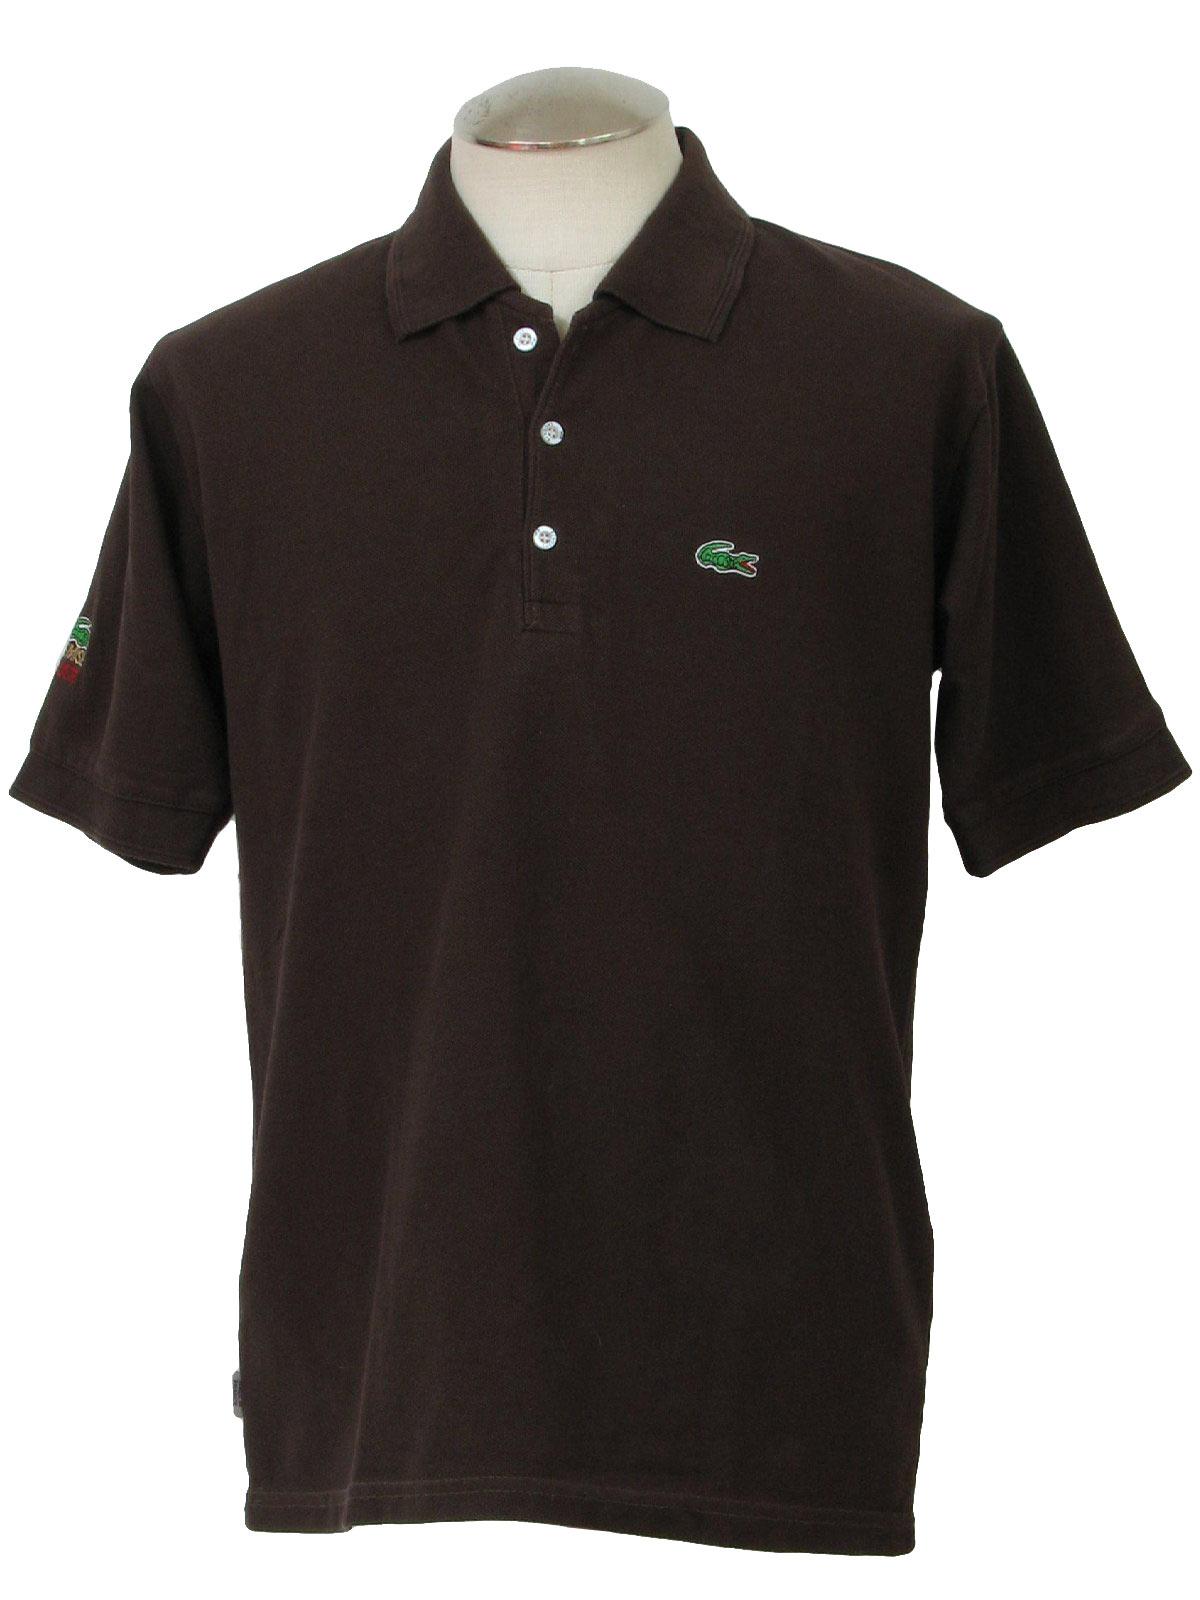 Lacoste Womens Polo Shirt